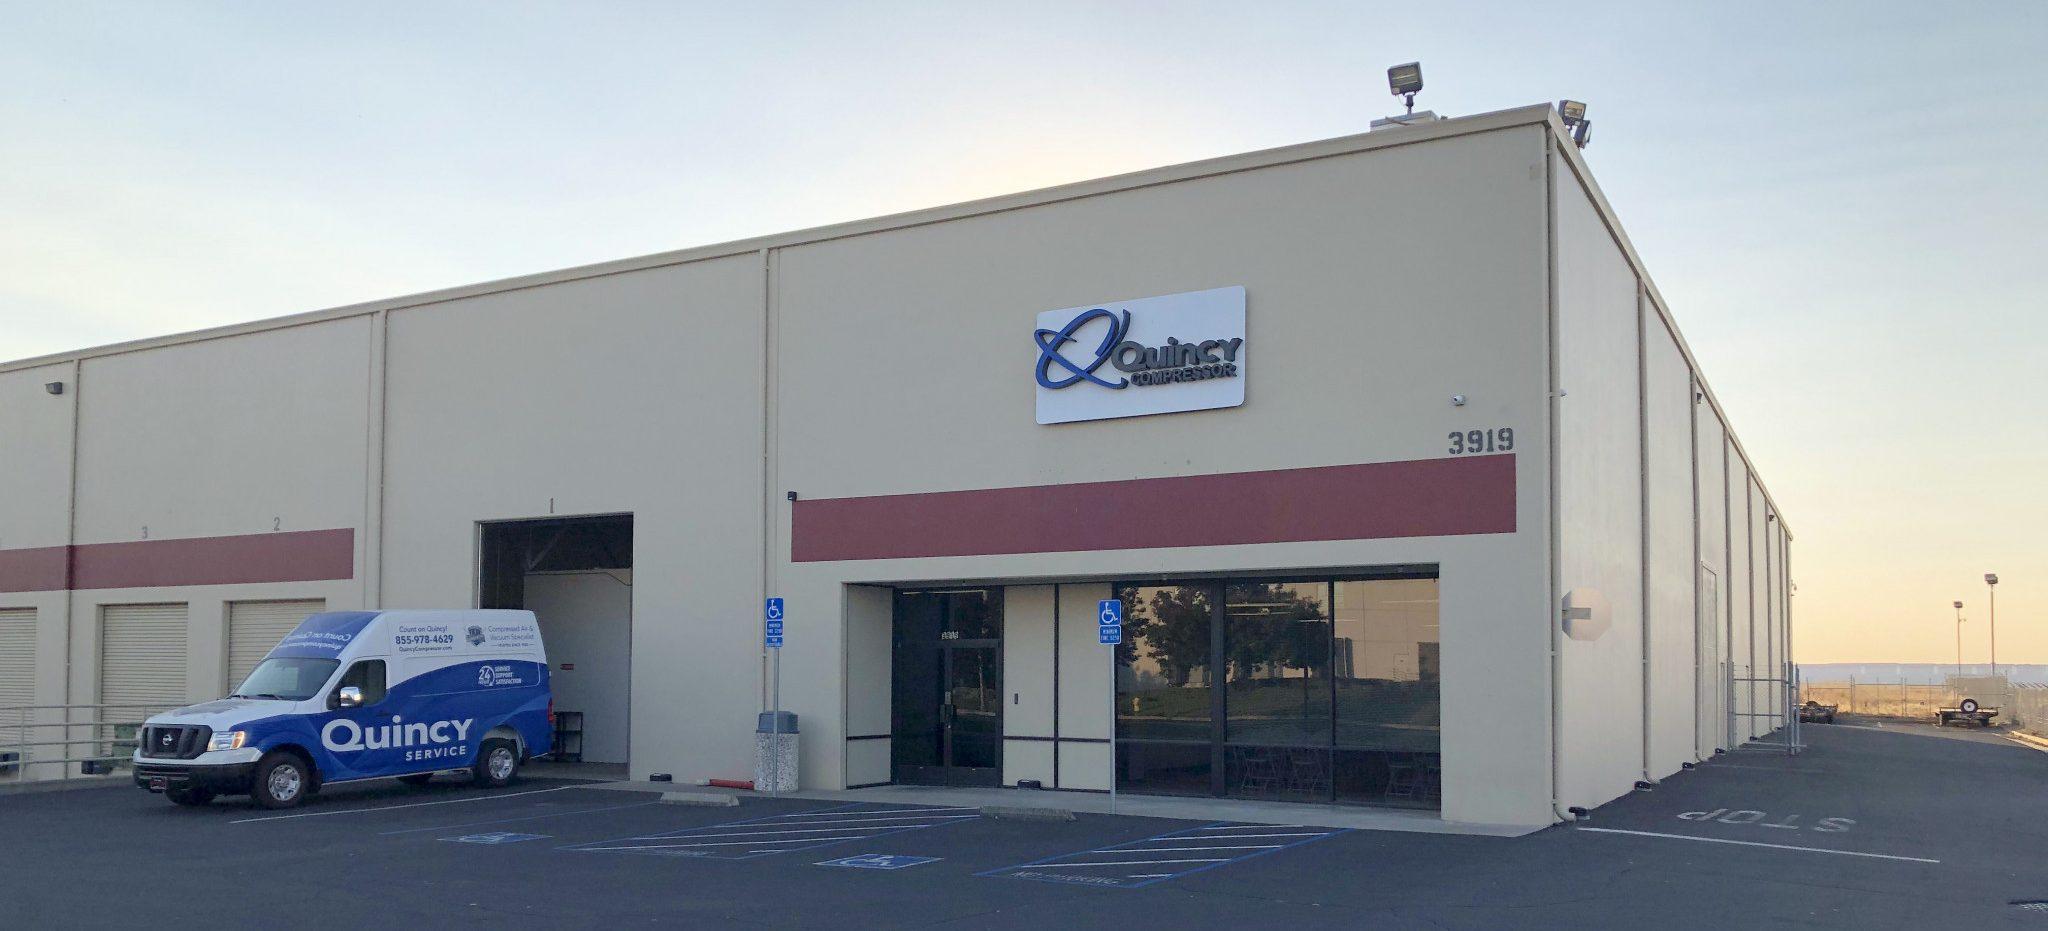 Quincy Compressor in West Sacramento, CA